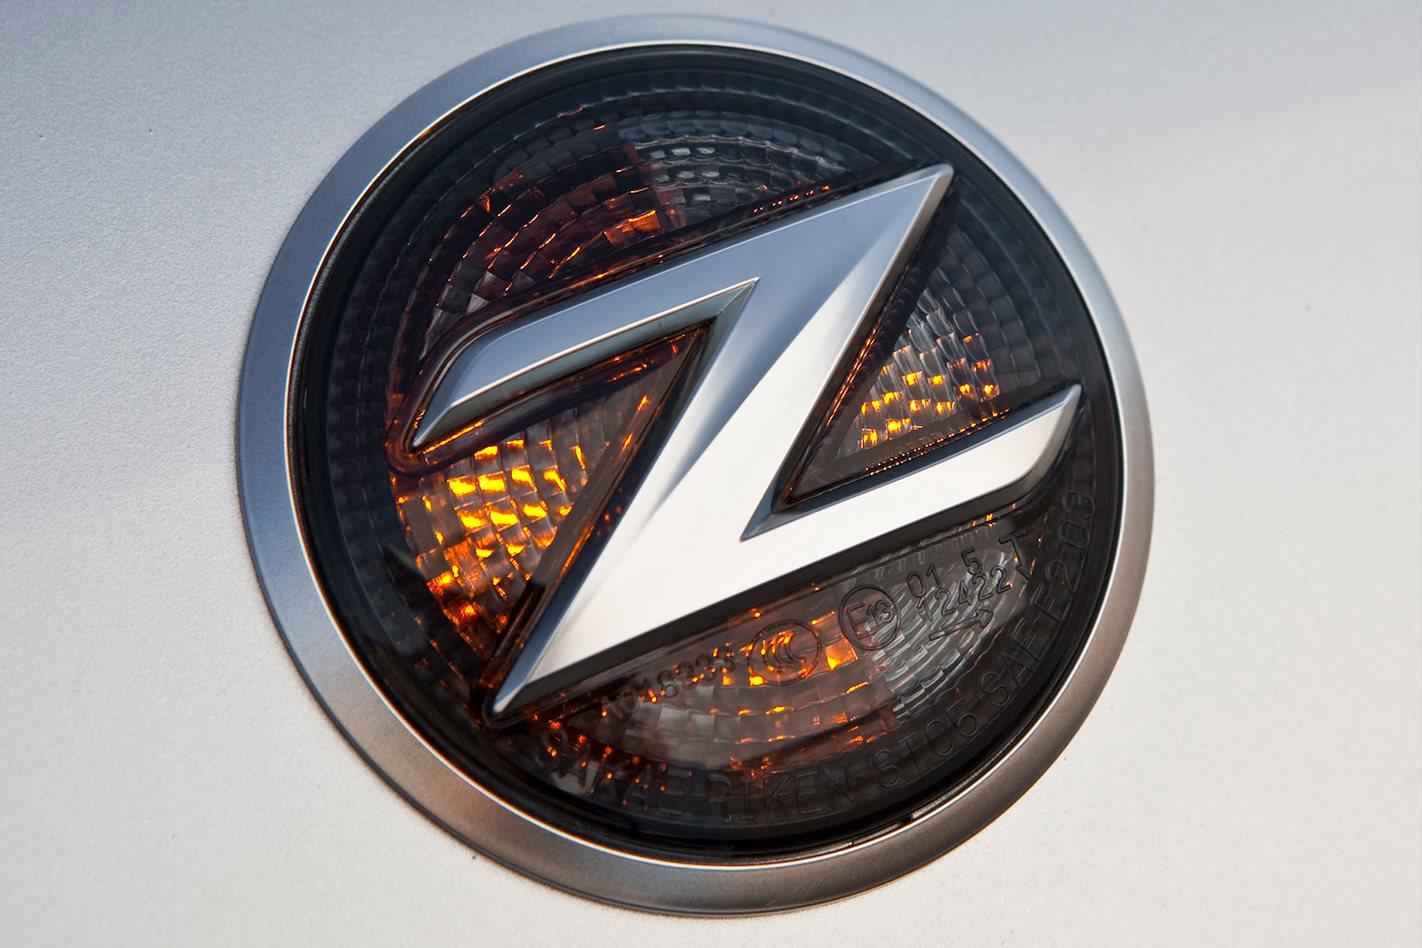 Nissan designer confirms next-gen Z project